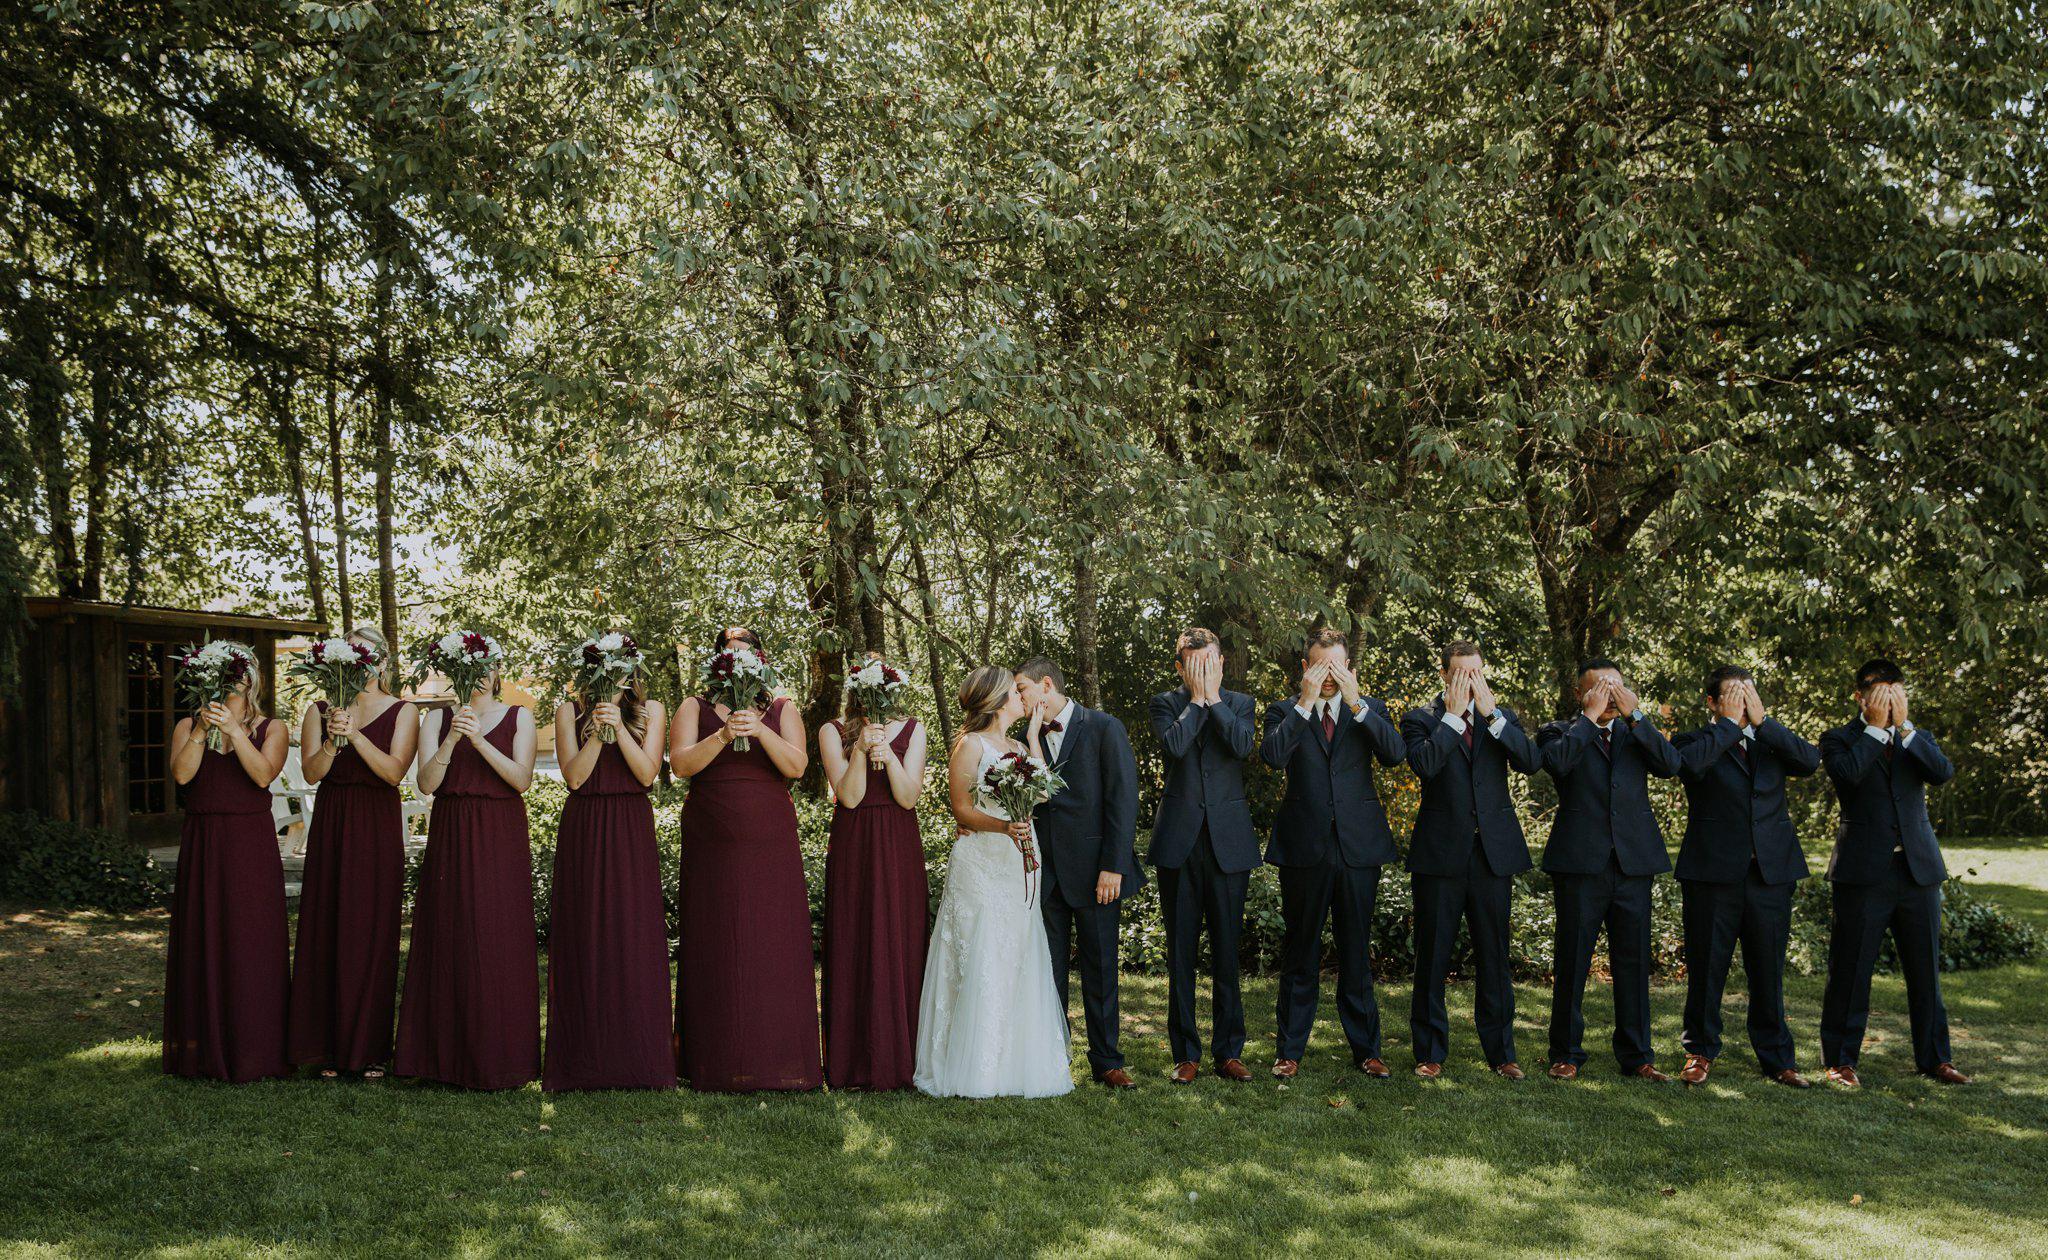 kristen-and-cody-the-kelley-farm-wedding-seattle-photographer-caitlyn-nikula-43.jpg